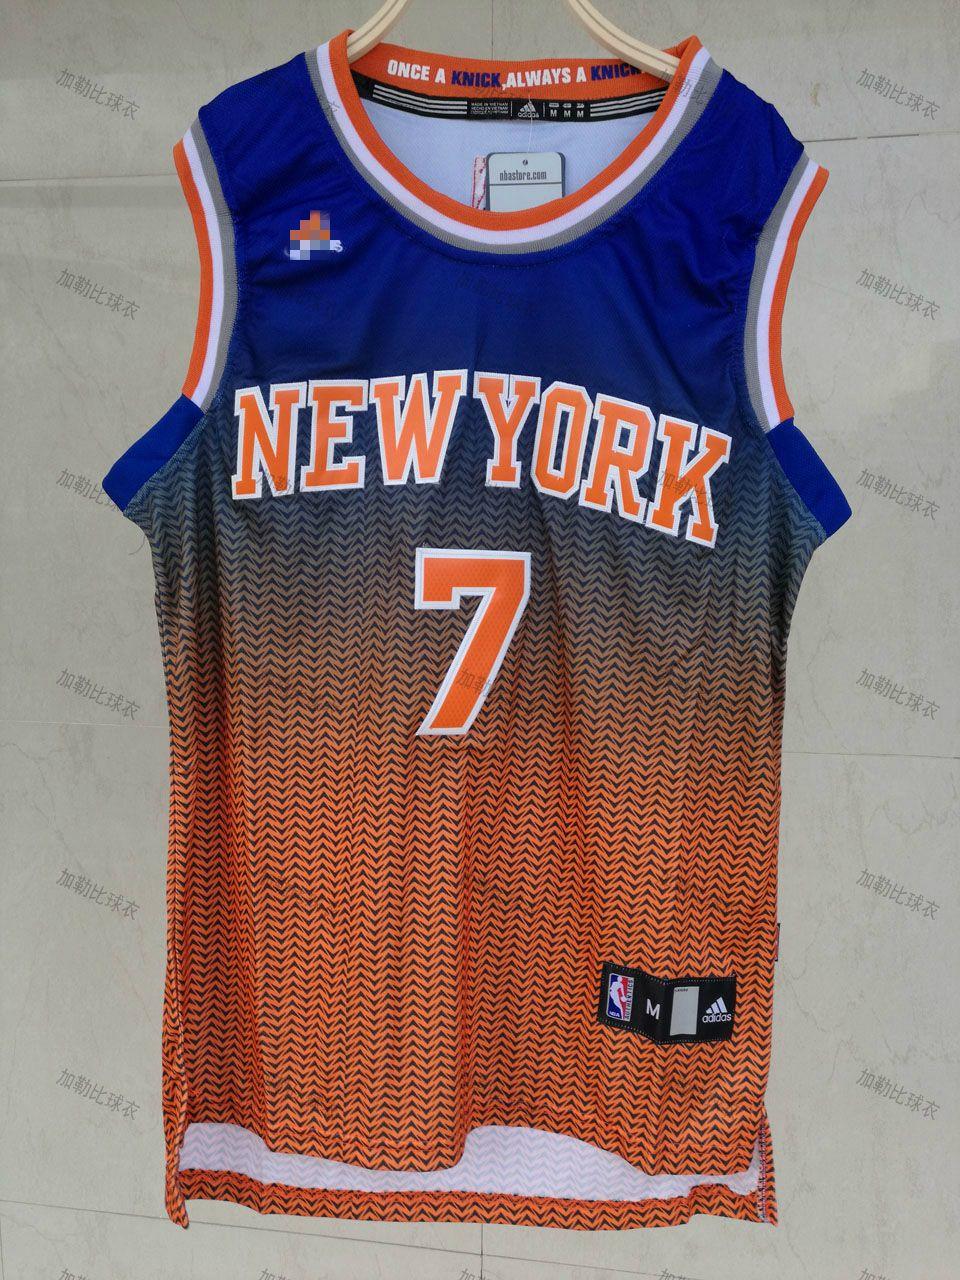 ADIDAS SWINGMAN NEW YORK KNICK 7 ANTHONY ORANGE BLUE BASKETBALL JERSEY   menwithclass  adidas   87fdf043e